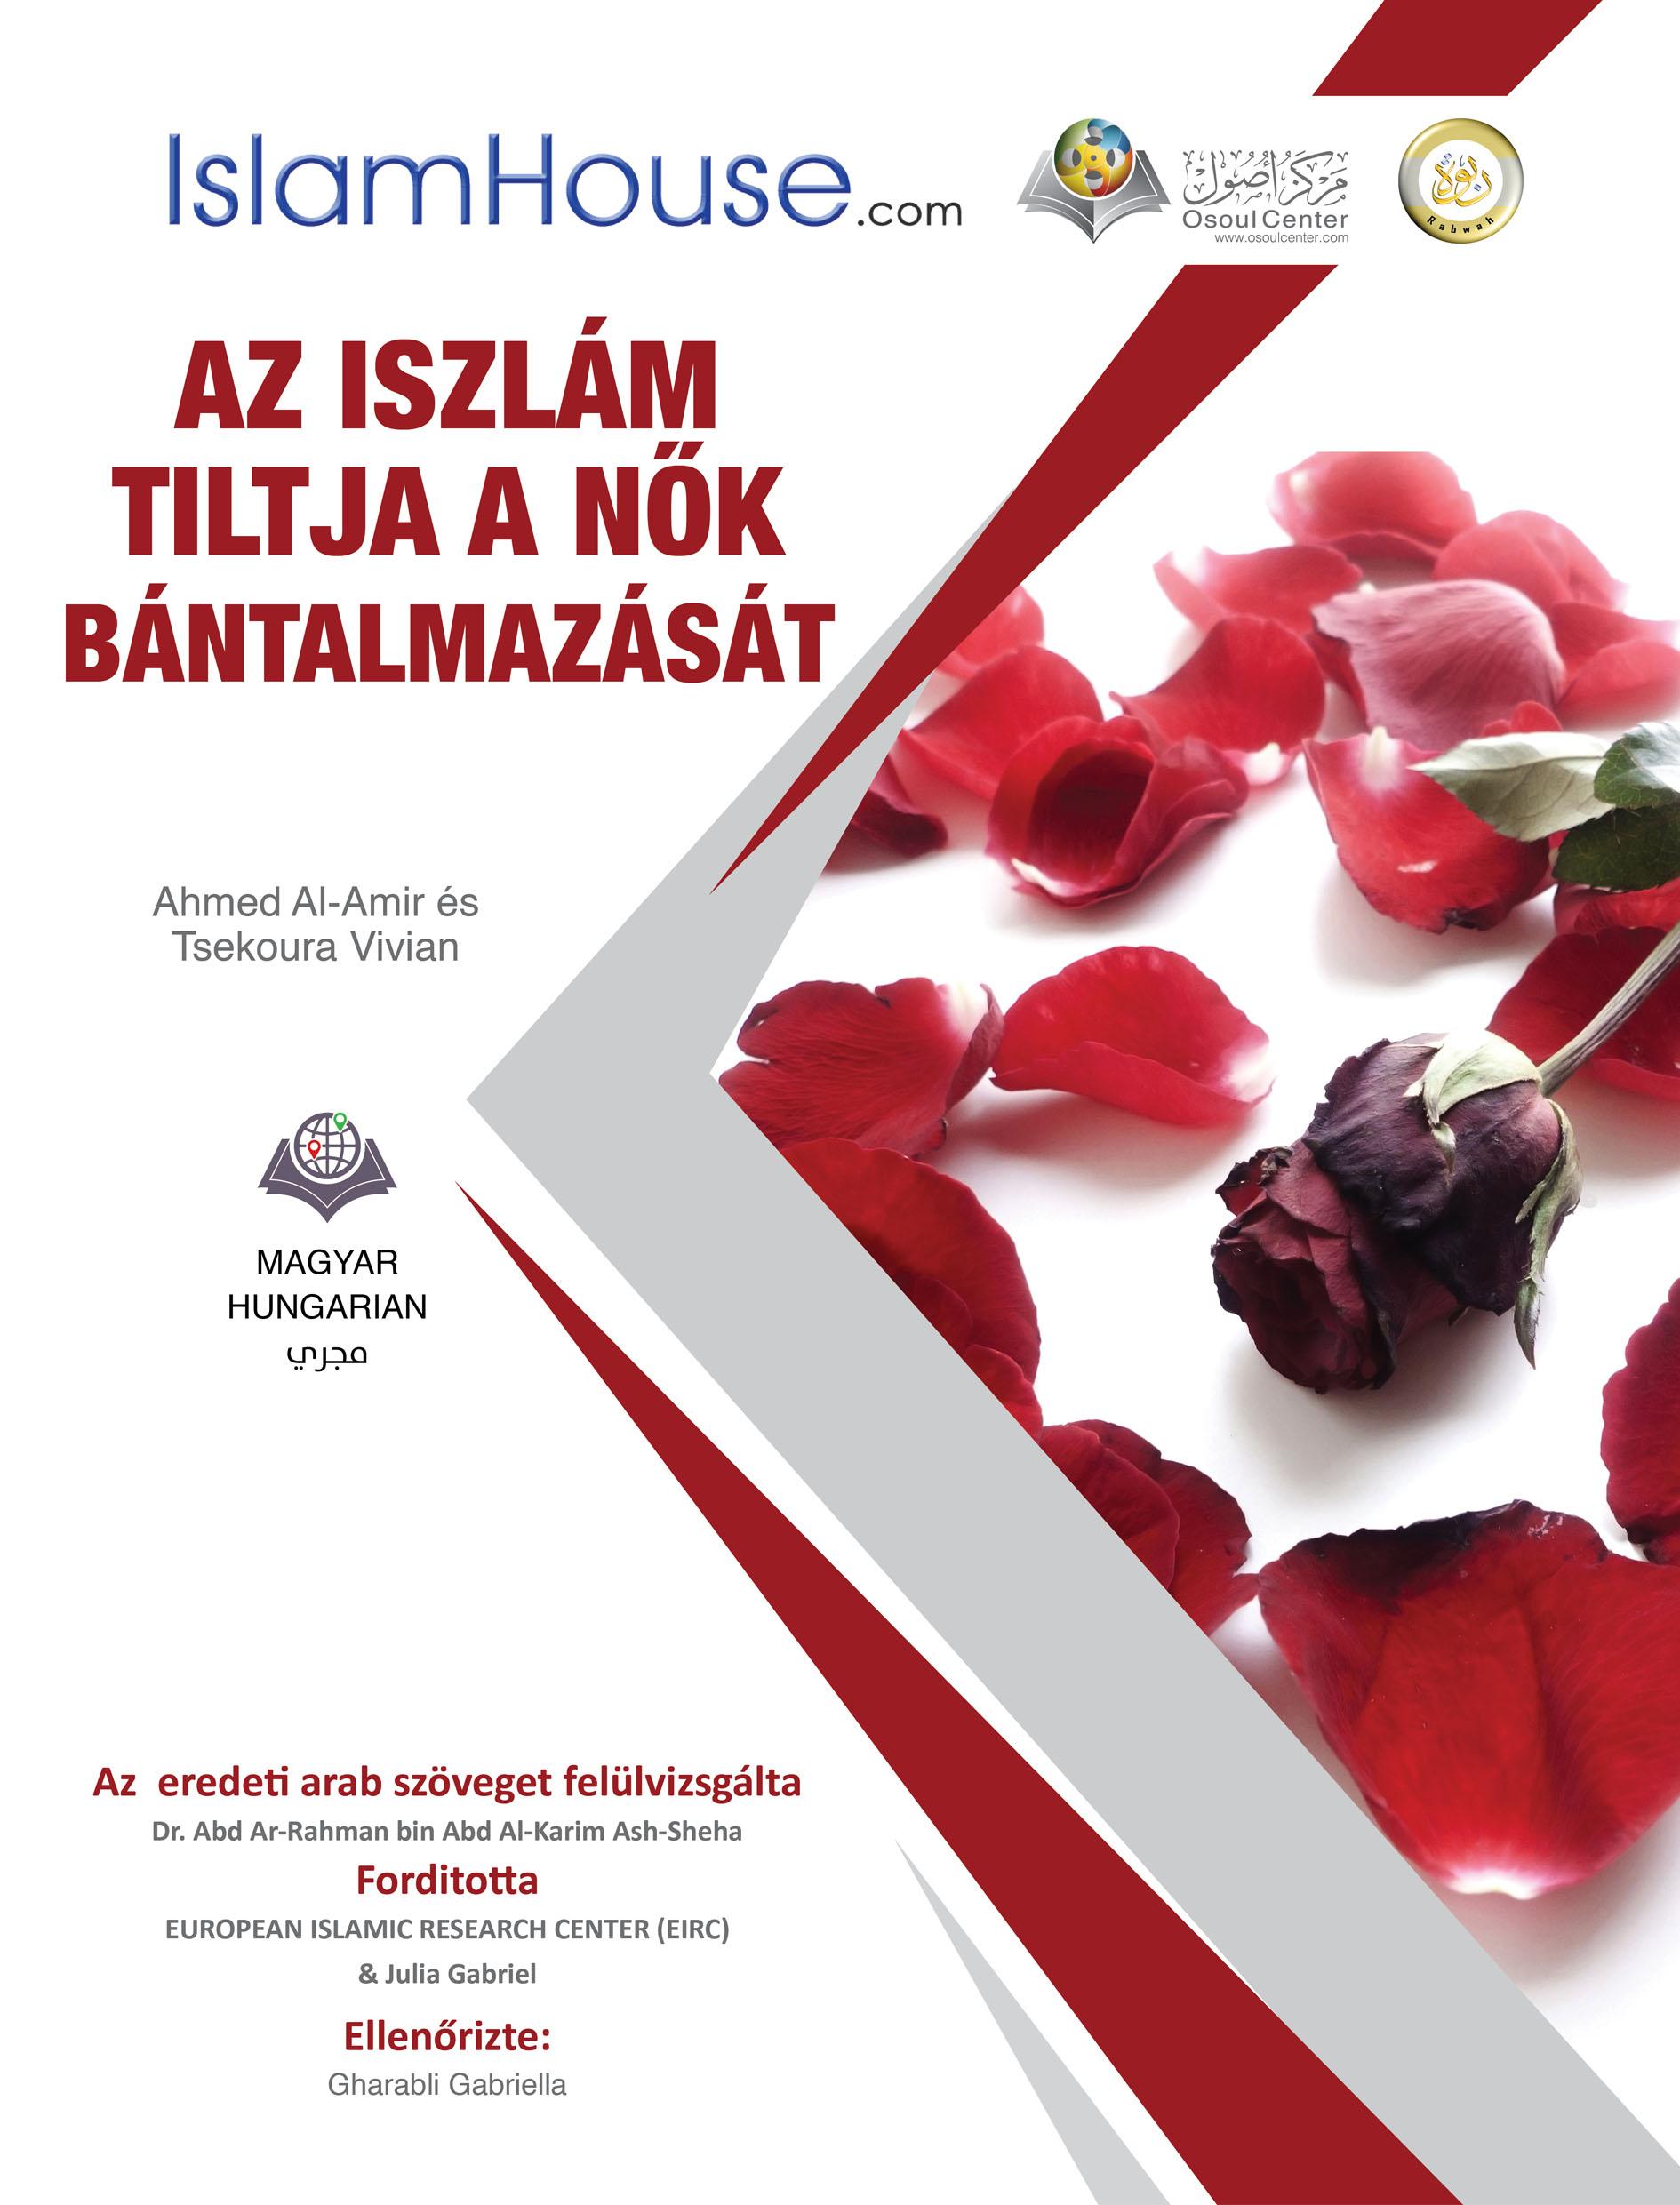 Beating Women is Forbidden in Islam (Hungarian language)